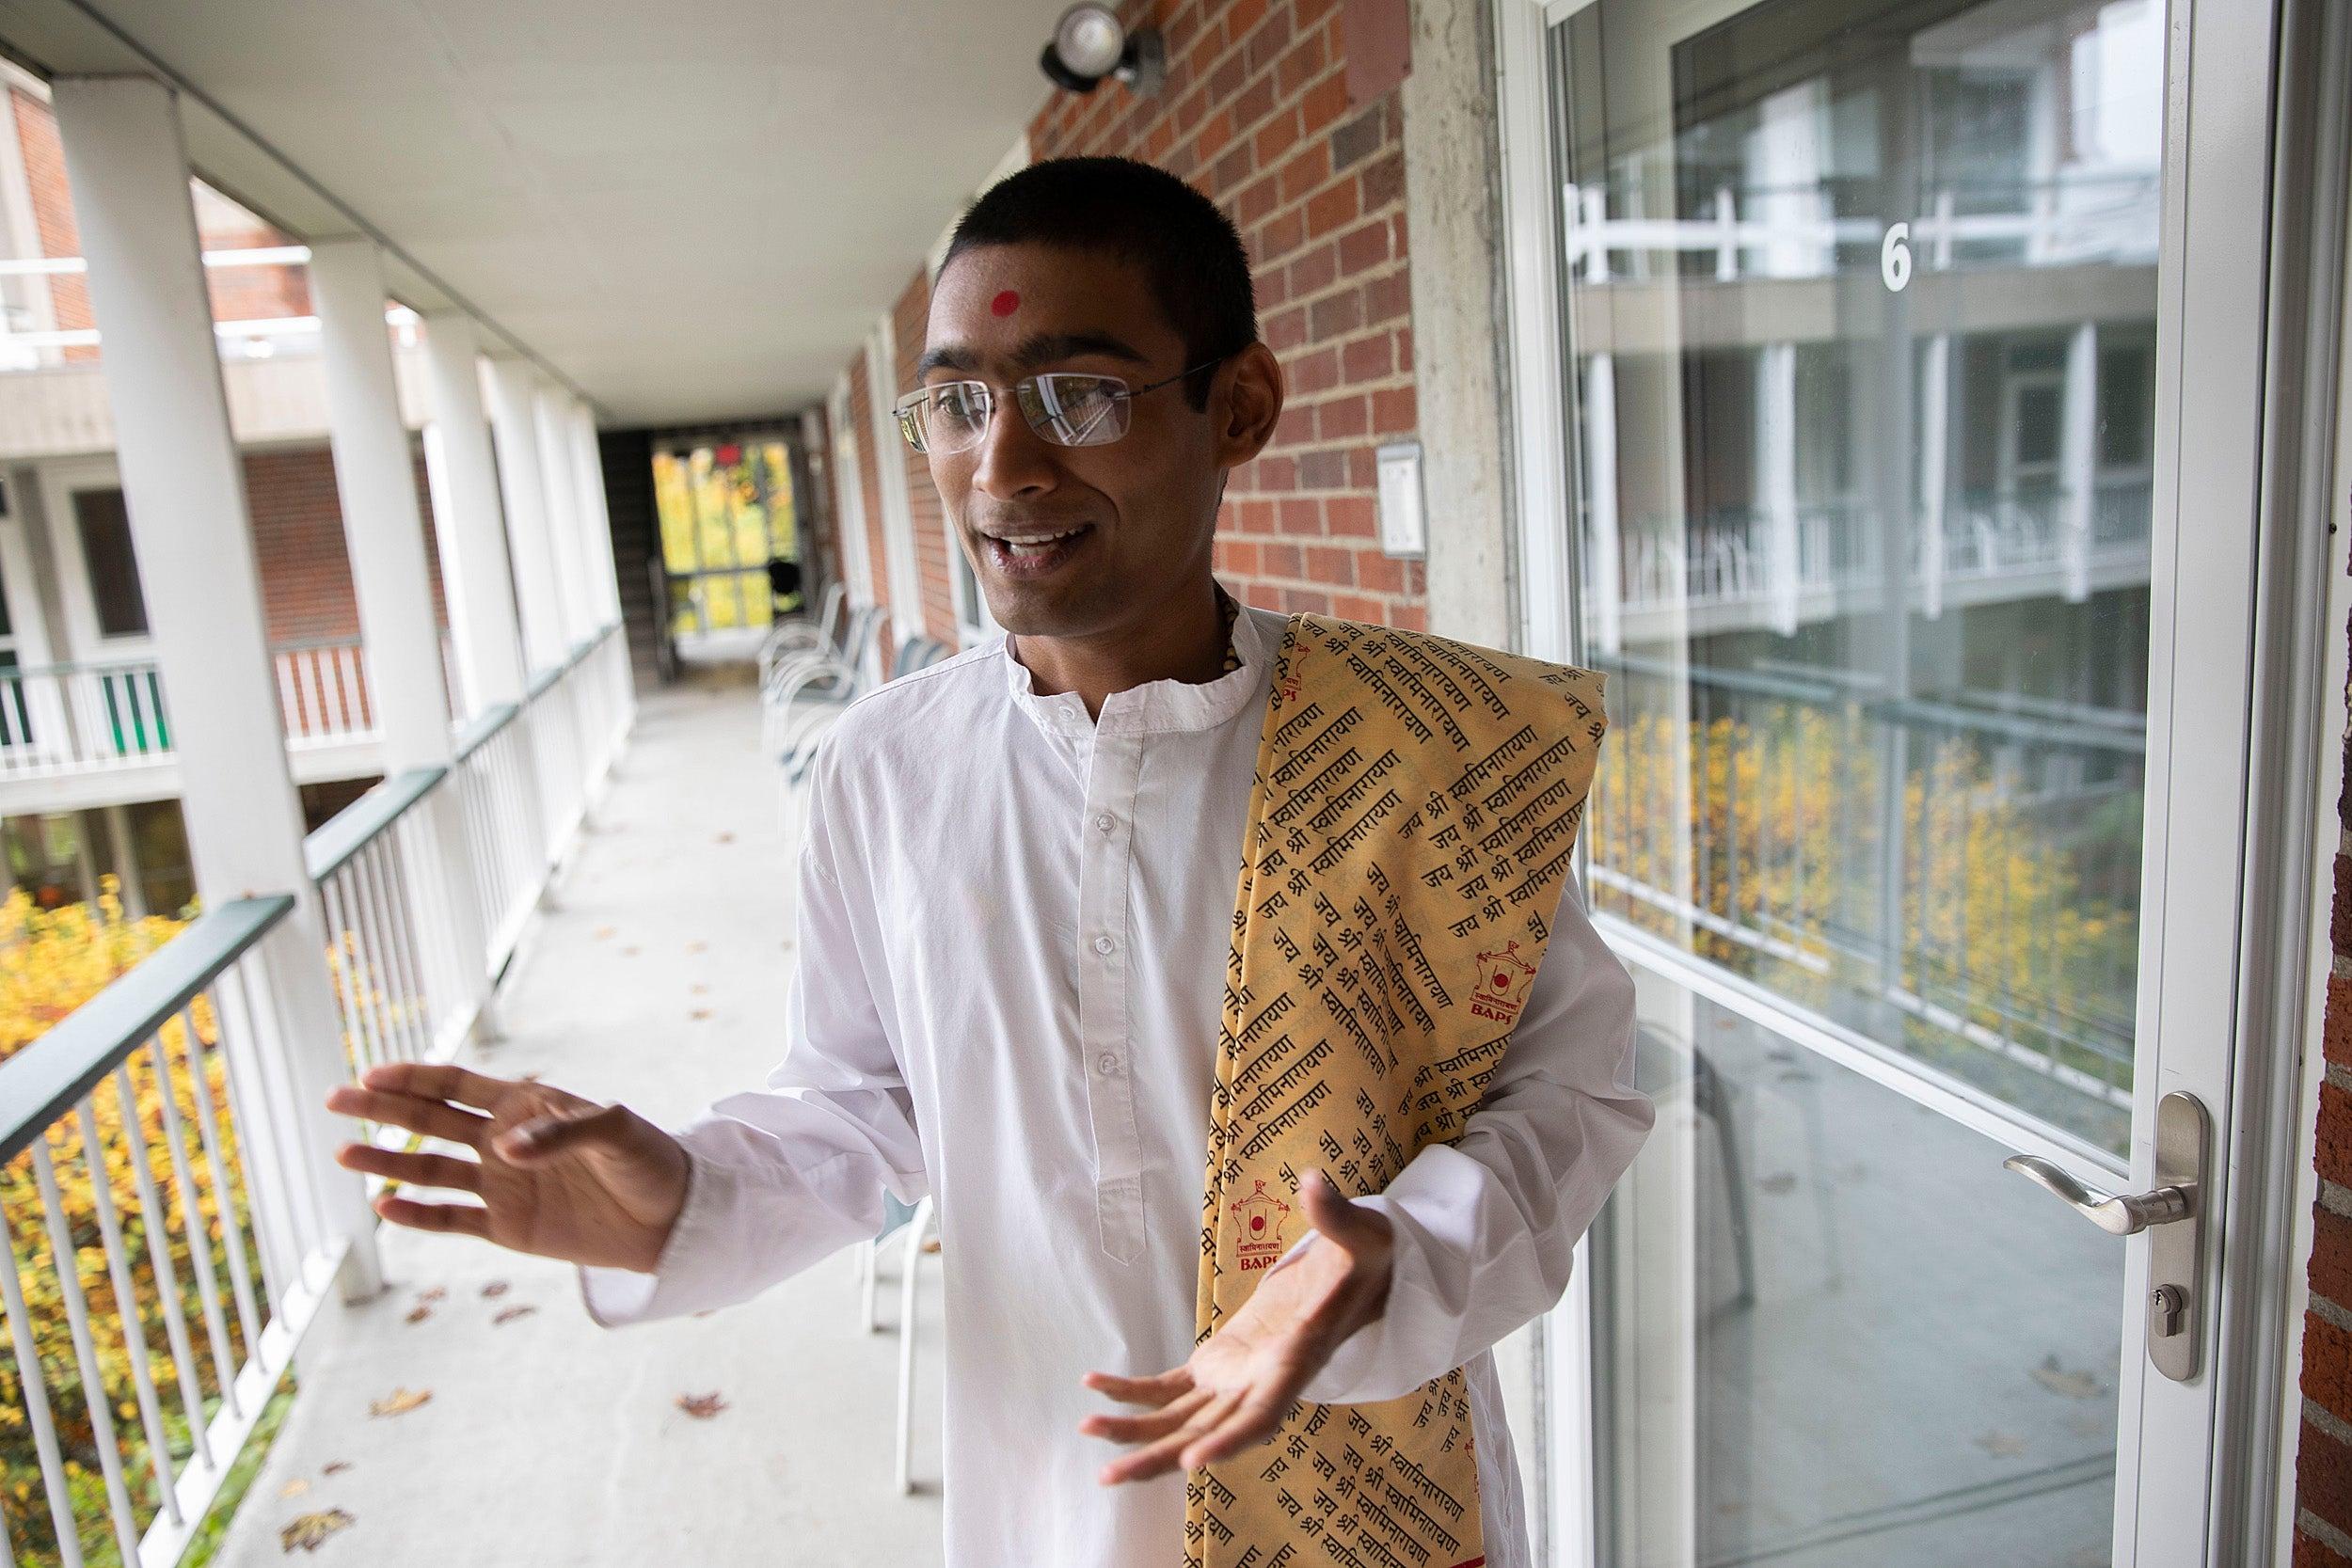 Sadhak Akshar Parsana talking in the walkway at the Divinity School.